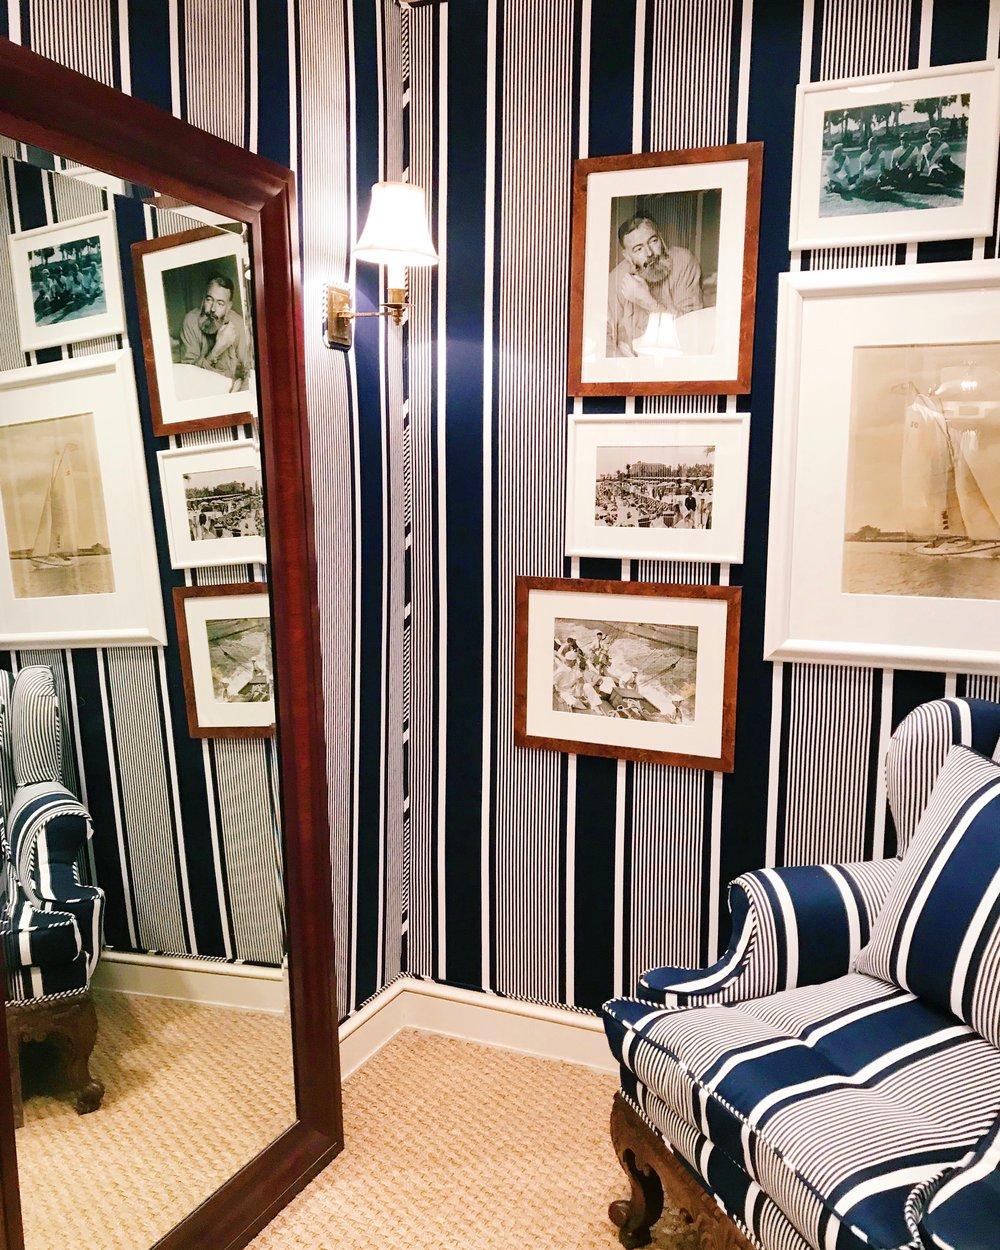 LCB STYLE PALM BEACH TRAVEL DIARY512 copy.jpg